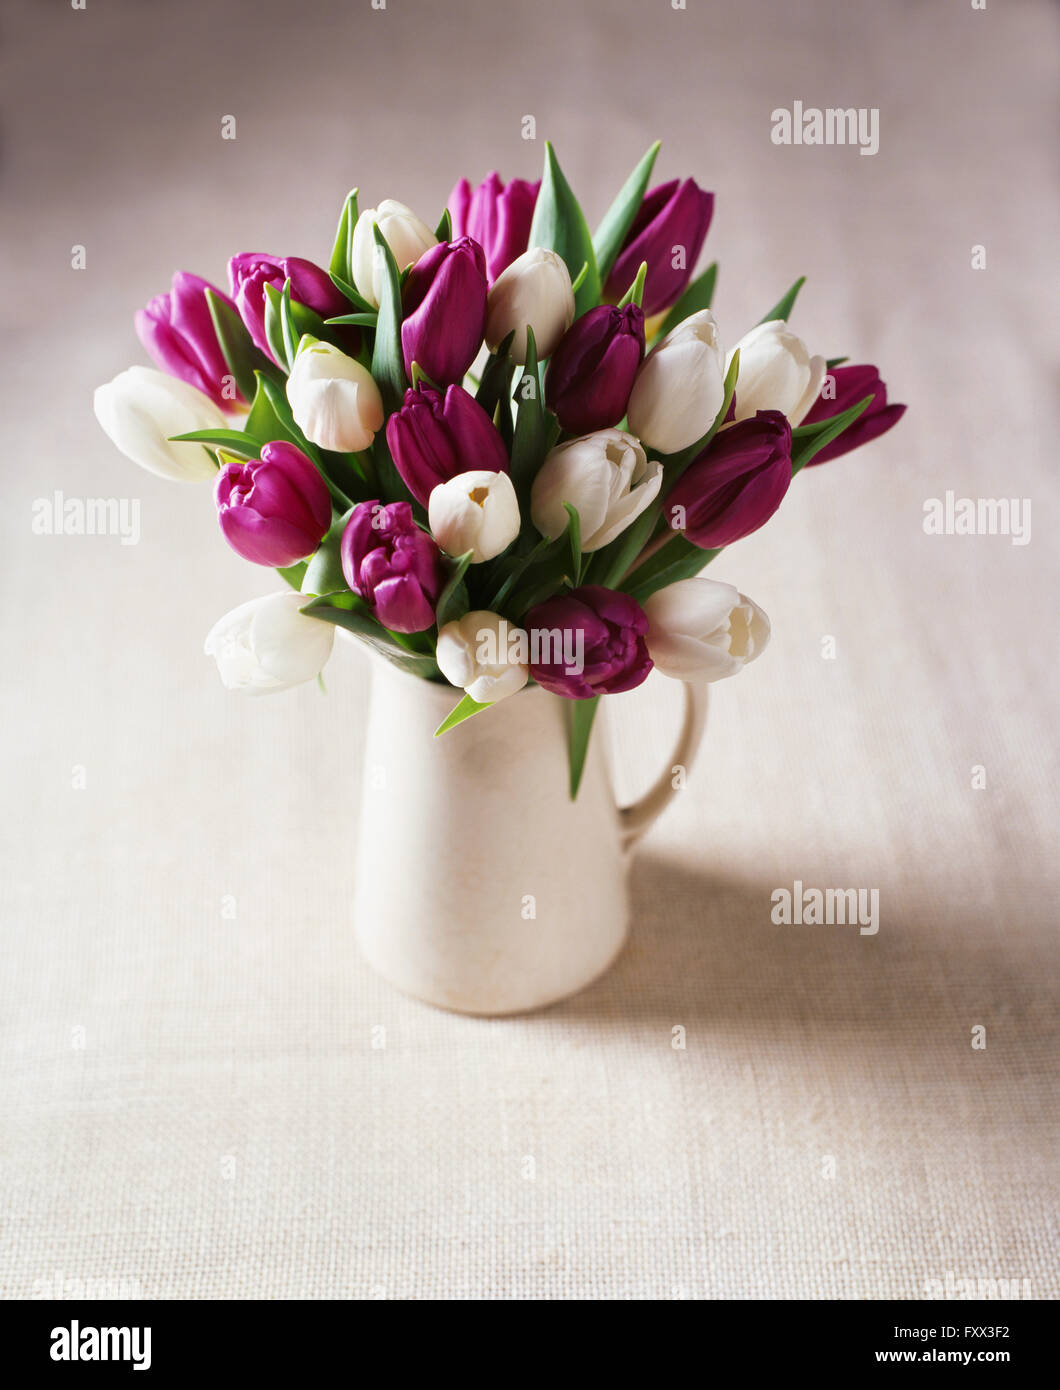 White And Purple Tulip Flower Arrangement In Jug Stock Photo Alamy